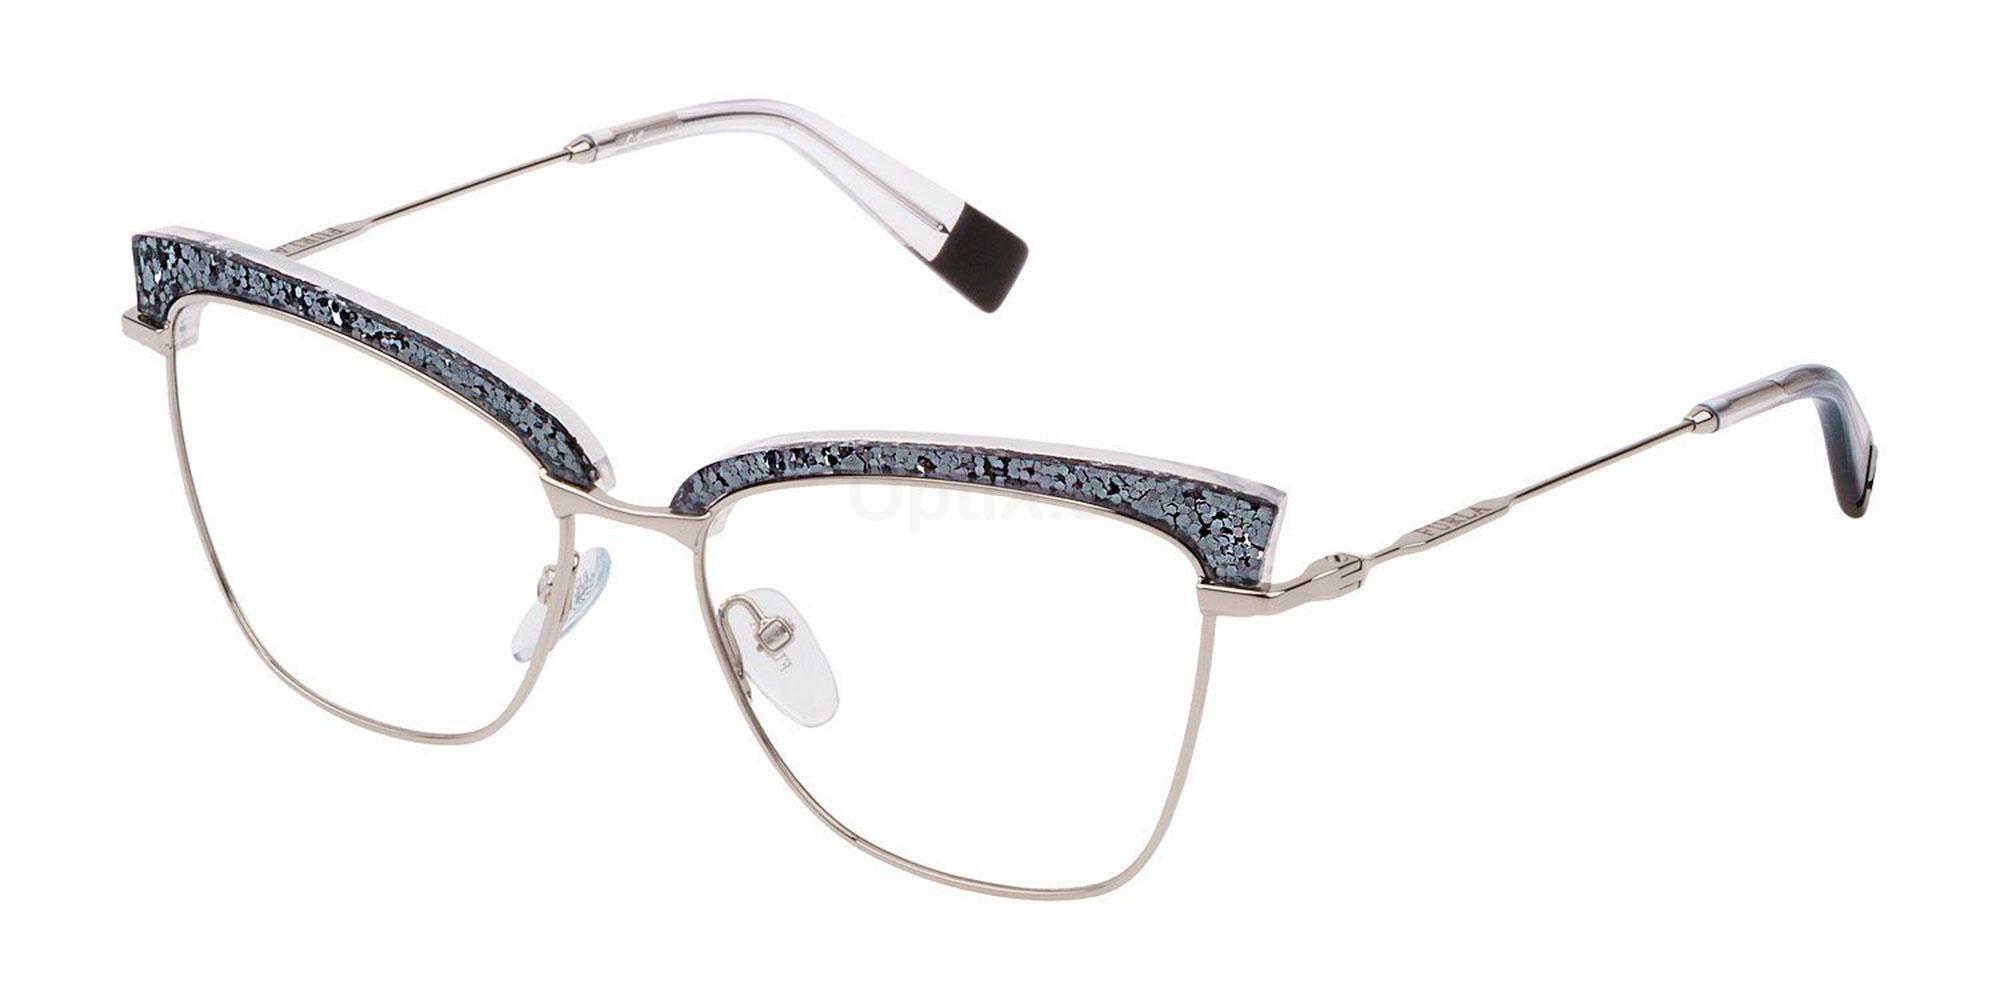 0579 VFU303 Glasses, Furla